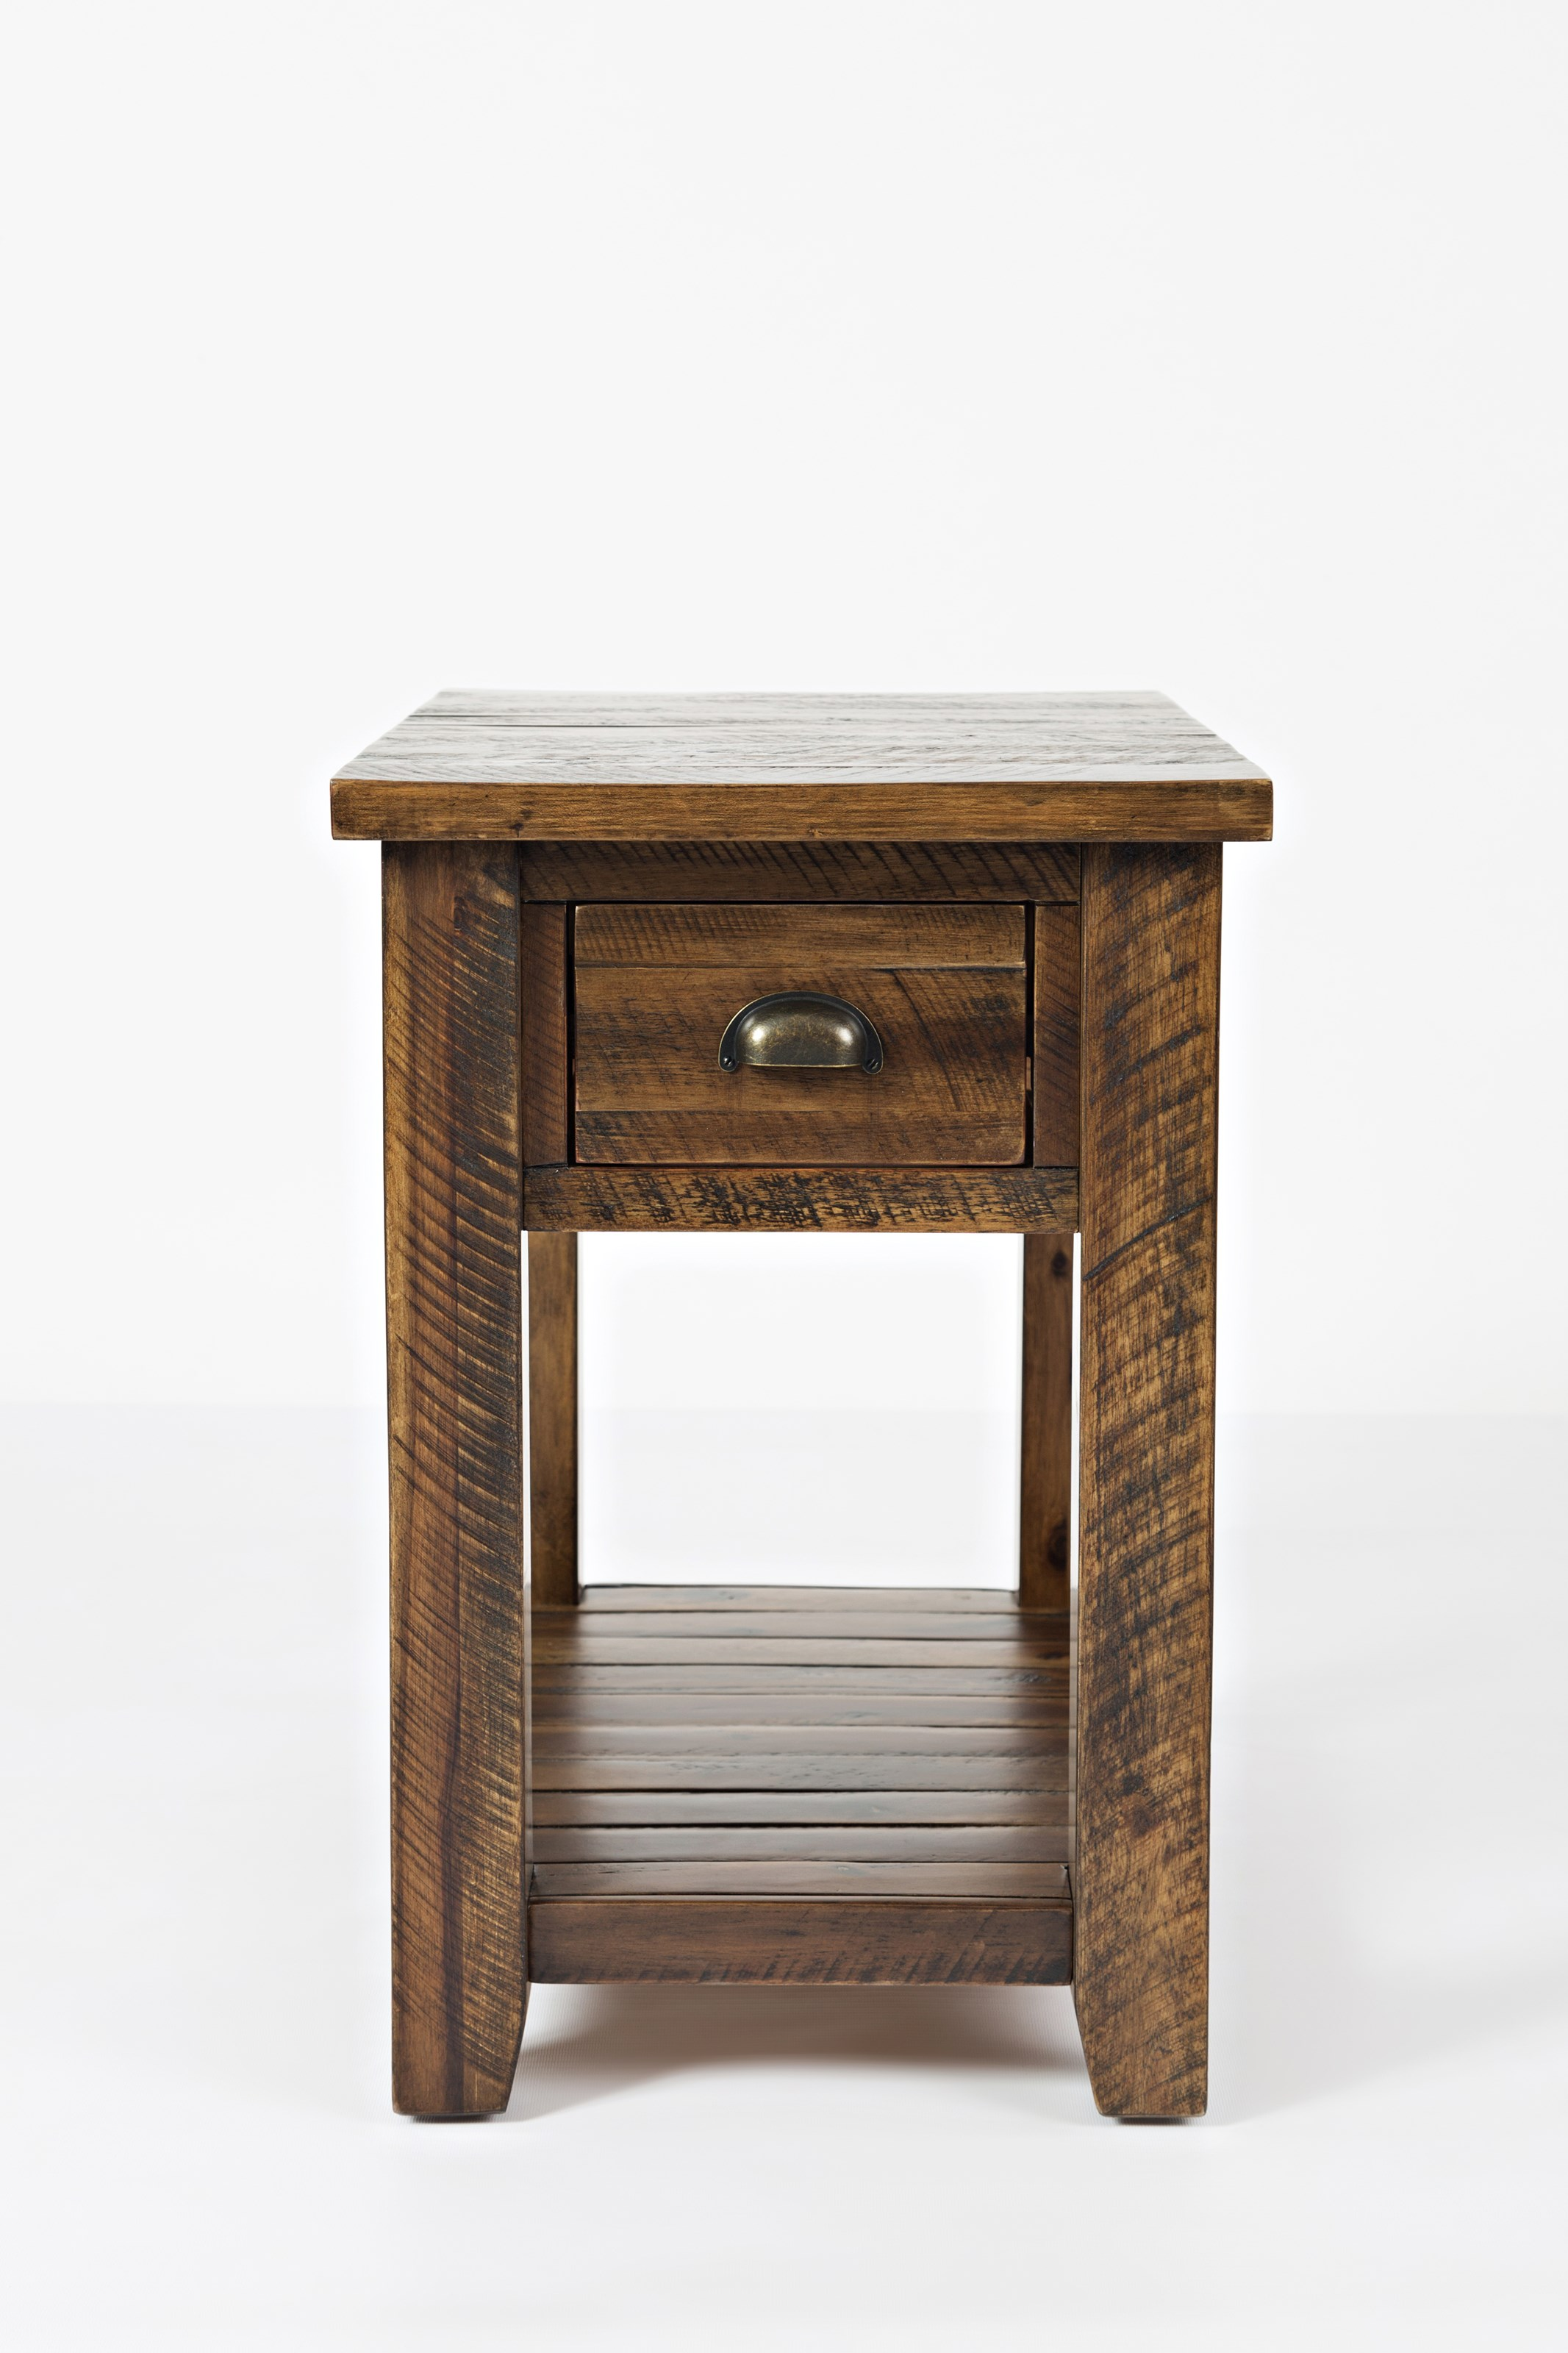 Artisan's Craft Chairside Table by Jofran at Jofran